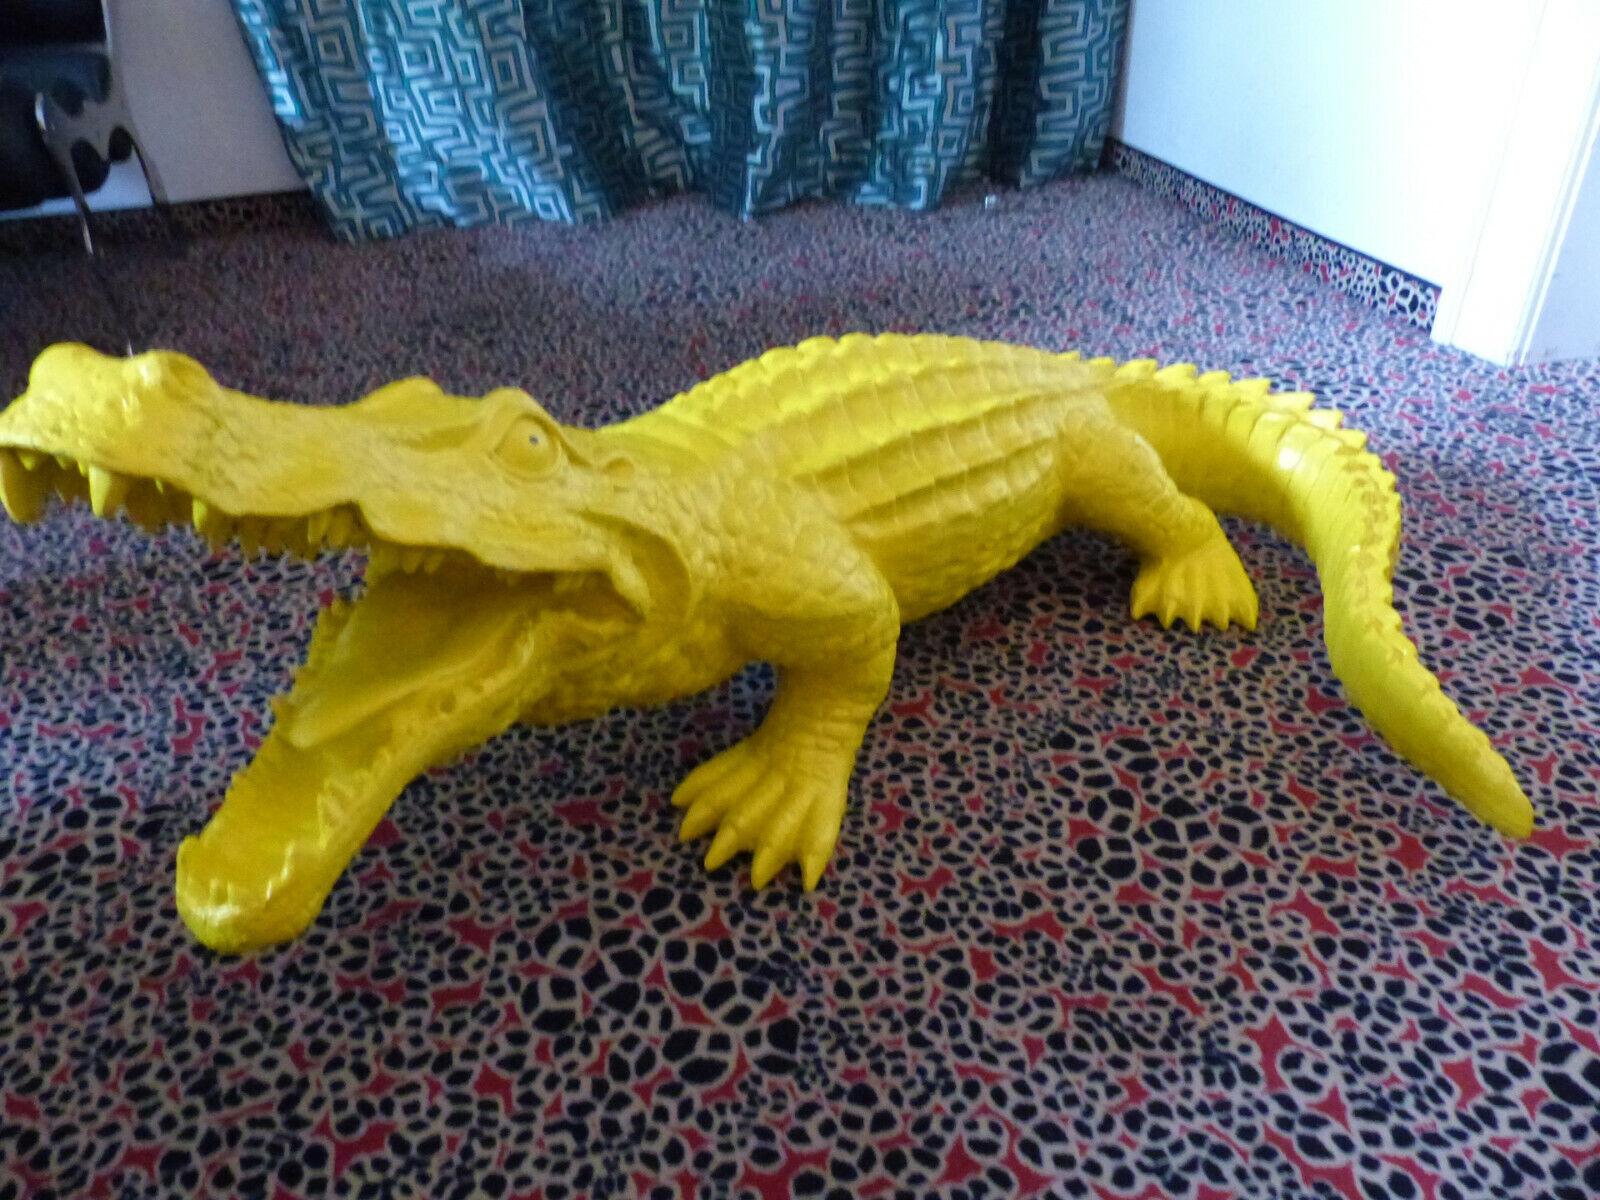 Krokodil aus Kunststoff, Neon gelb, neuwertig, 123 cm